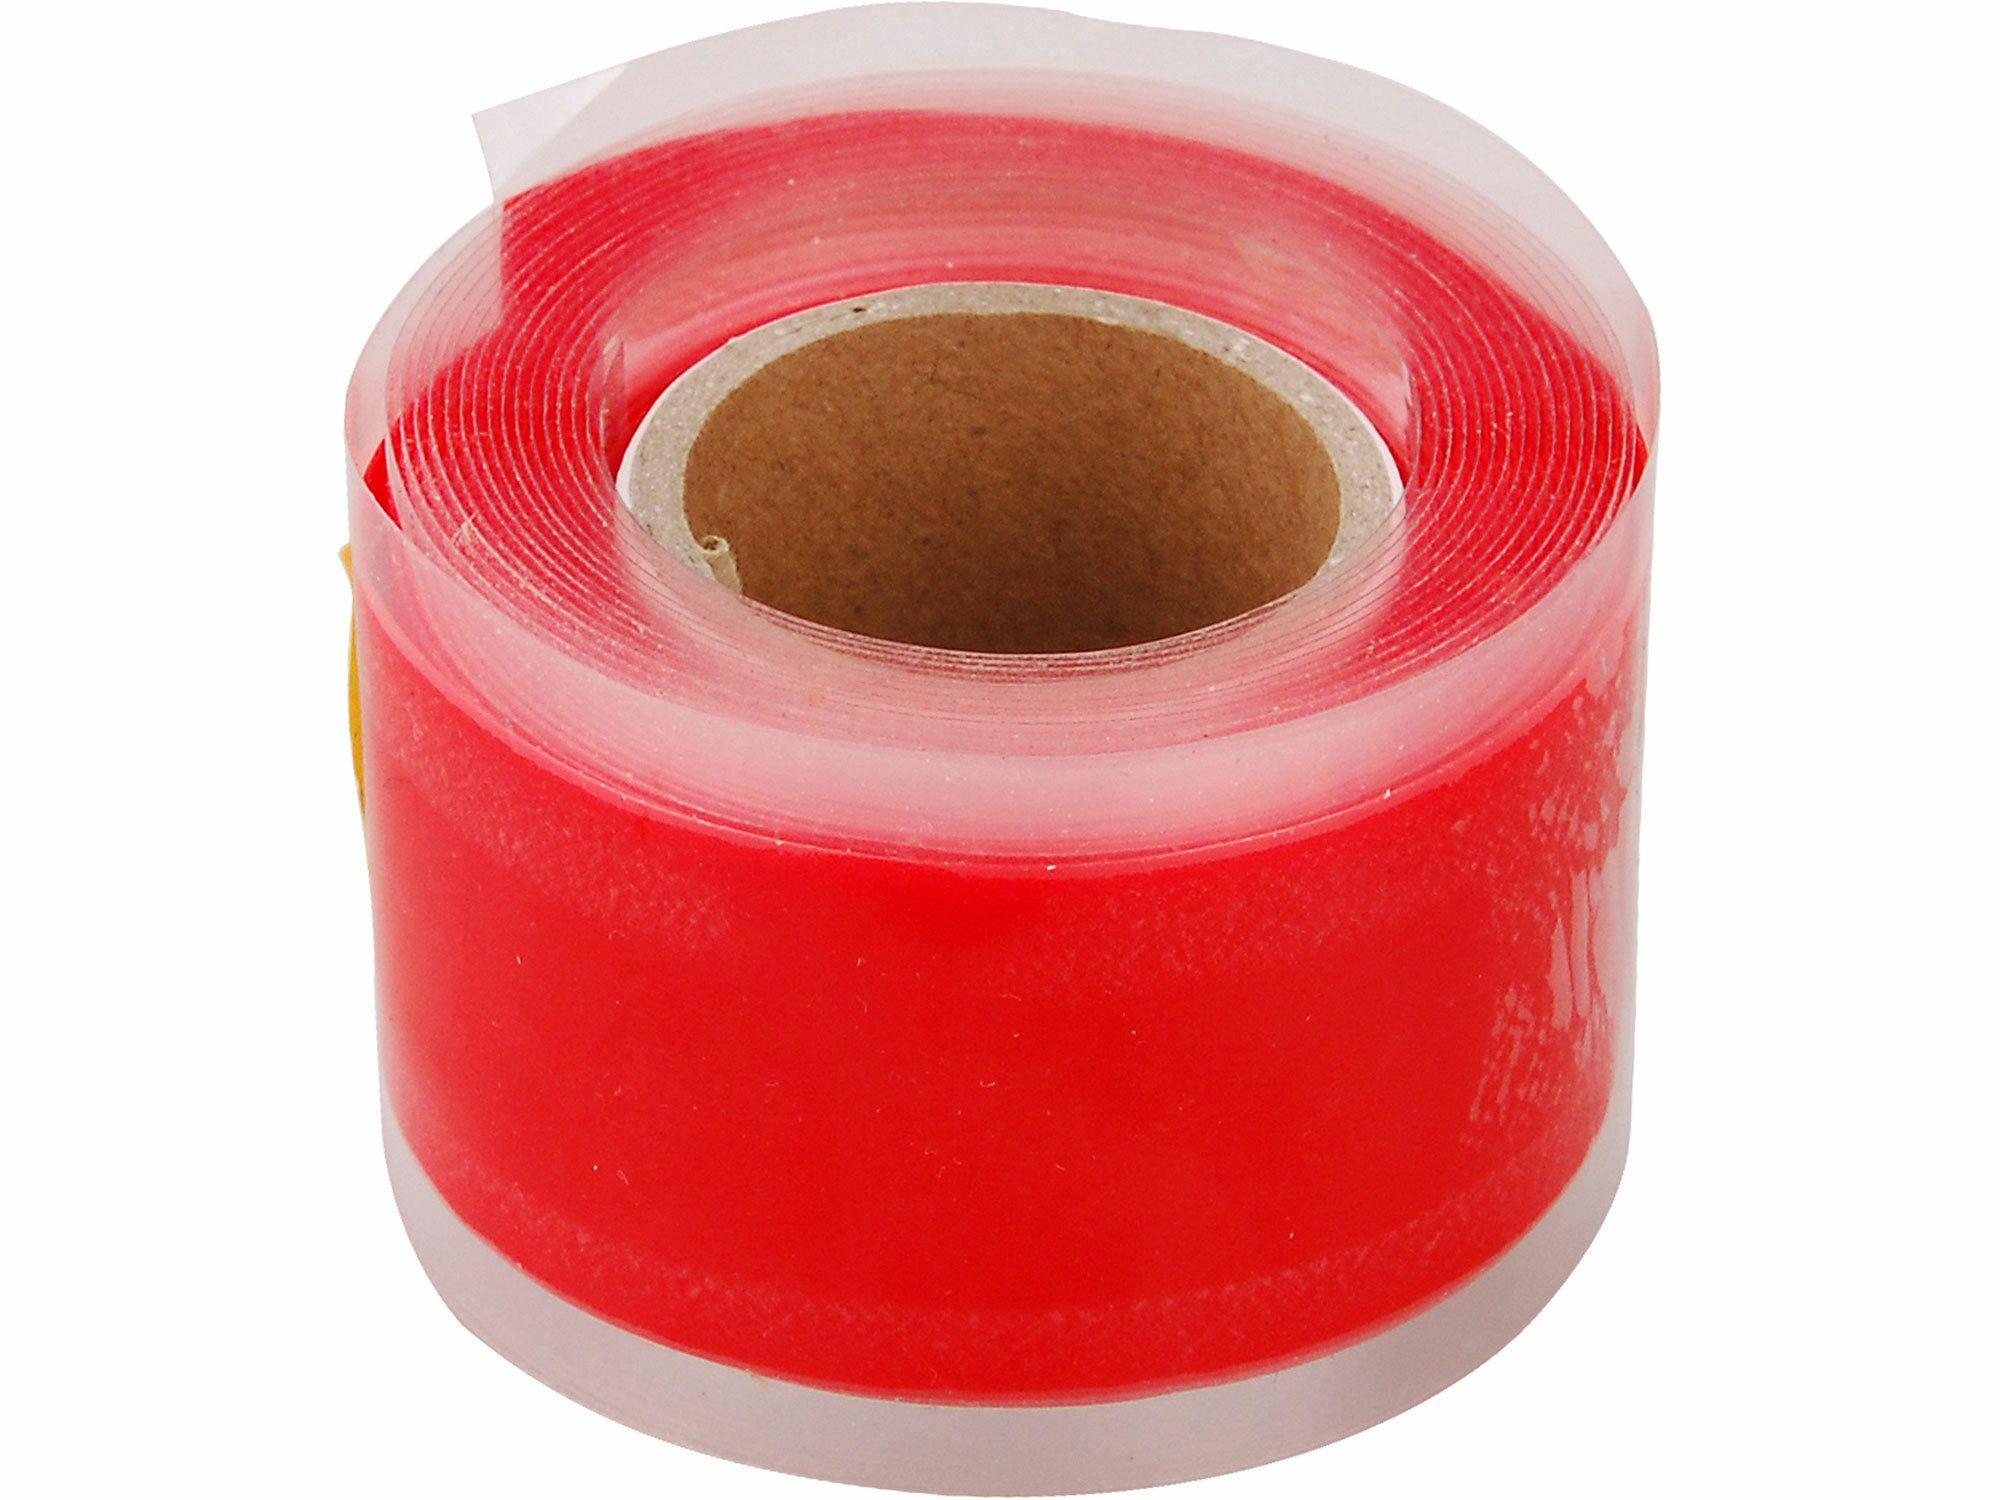 Páska silikonová samofixační, 25mm x 3,3m, červená barva EXTOL-PREMIUM